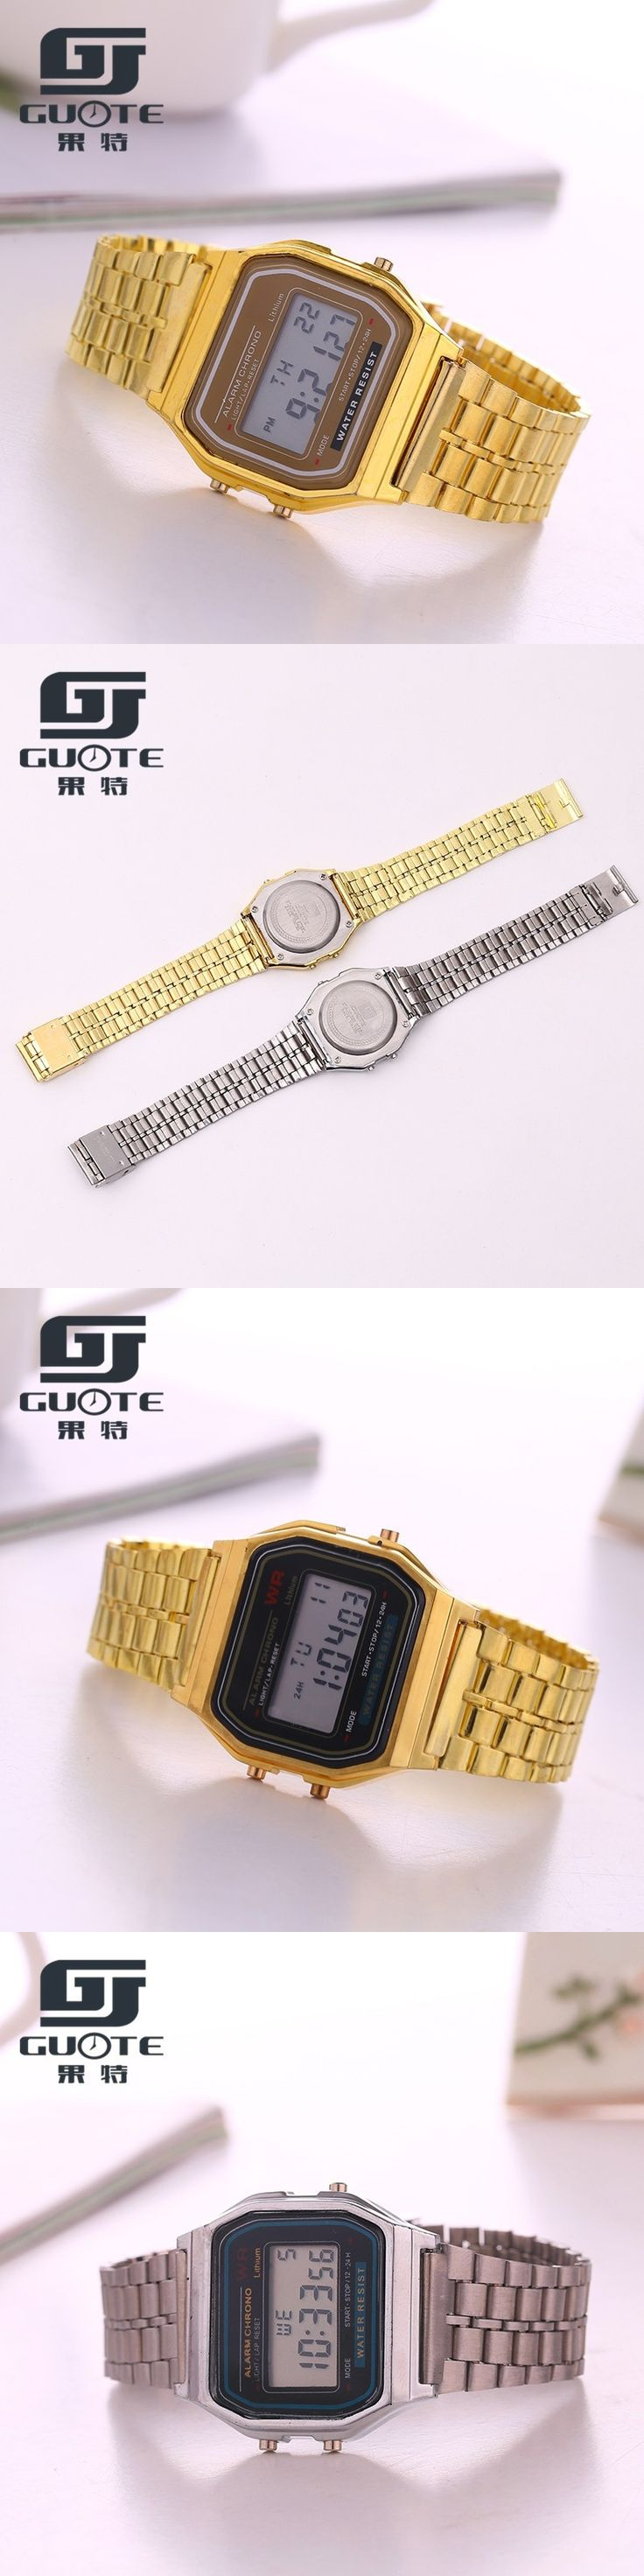 2017New fashion design LED Watch Multifunction Life Waterproof Watch For Men Women Cheap Electronic Digital watches clock silver